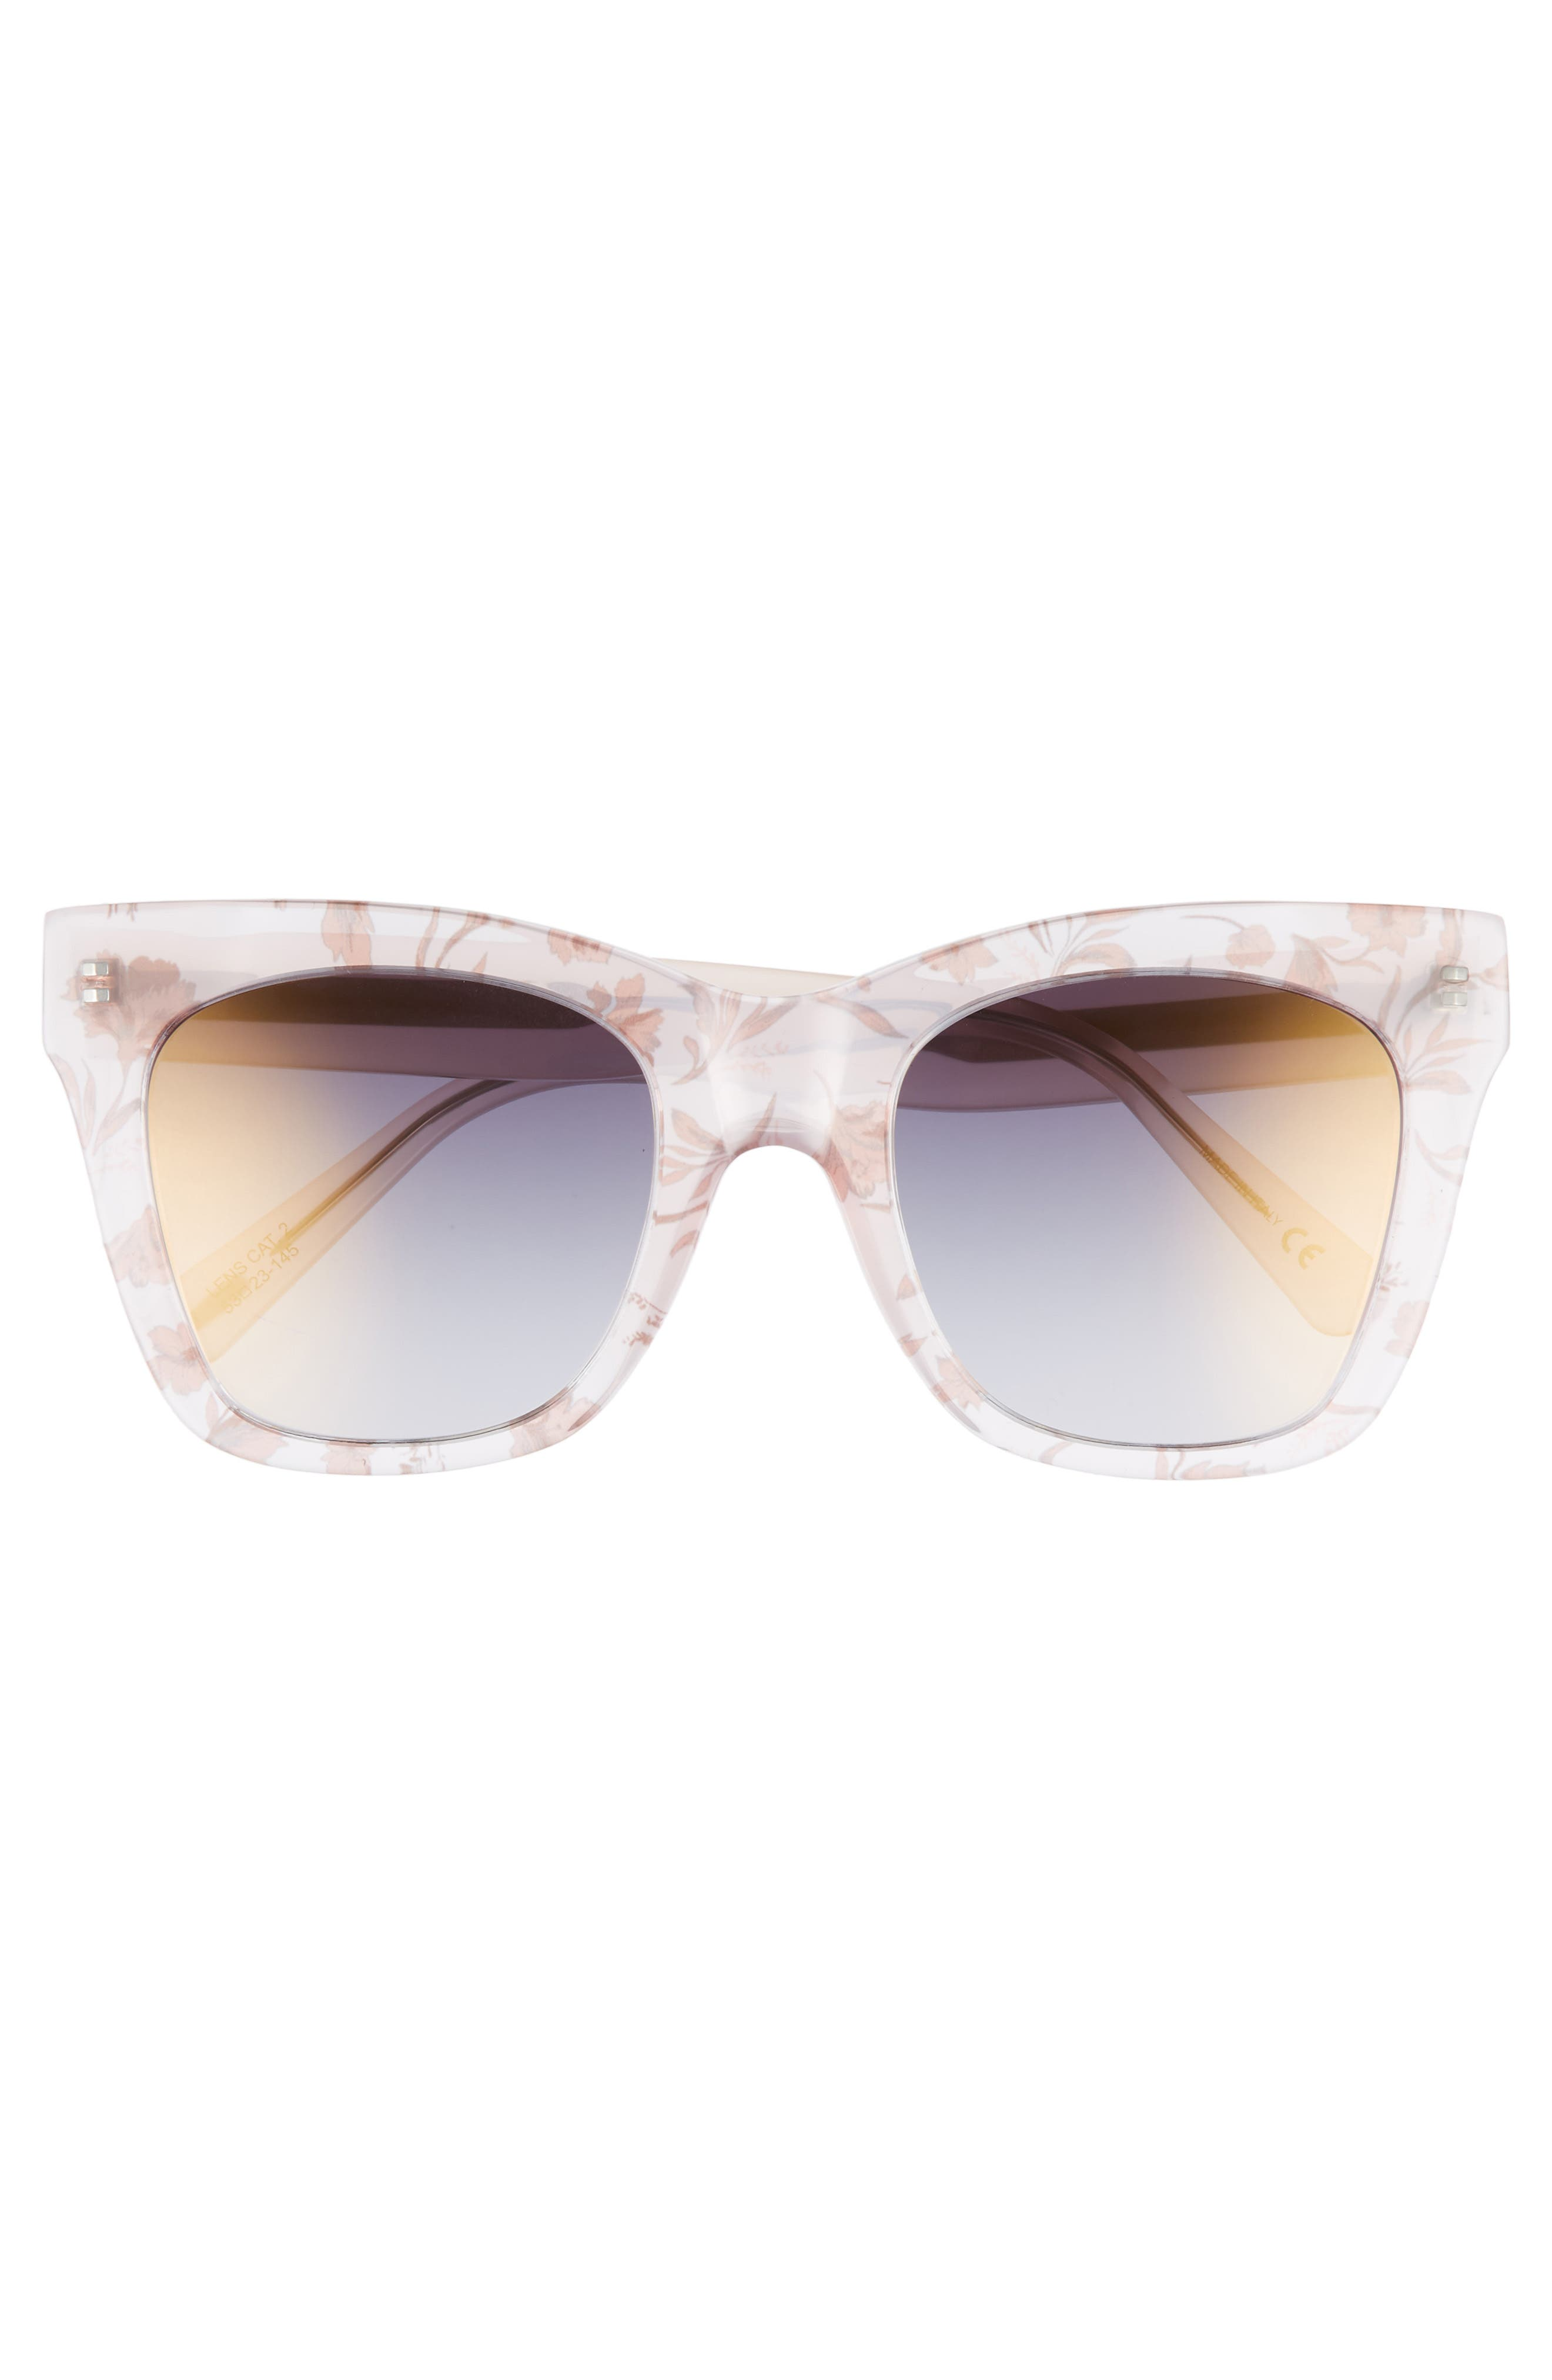 D'BLANC Beach Vida 52mm Sunglasses,                             Alternate thumbnail 3, color,                             Something Nice